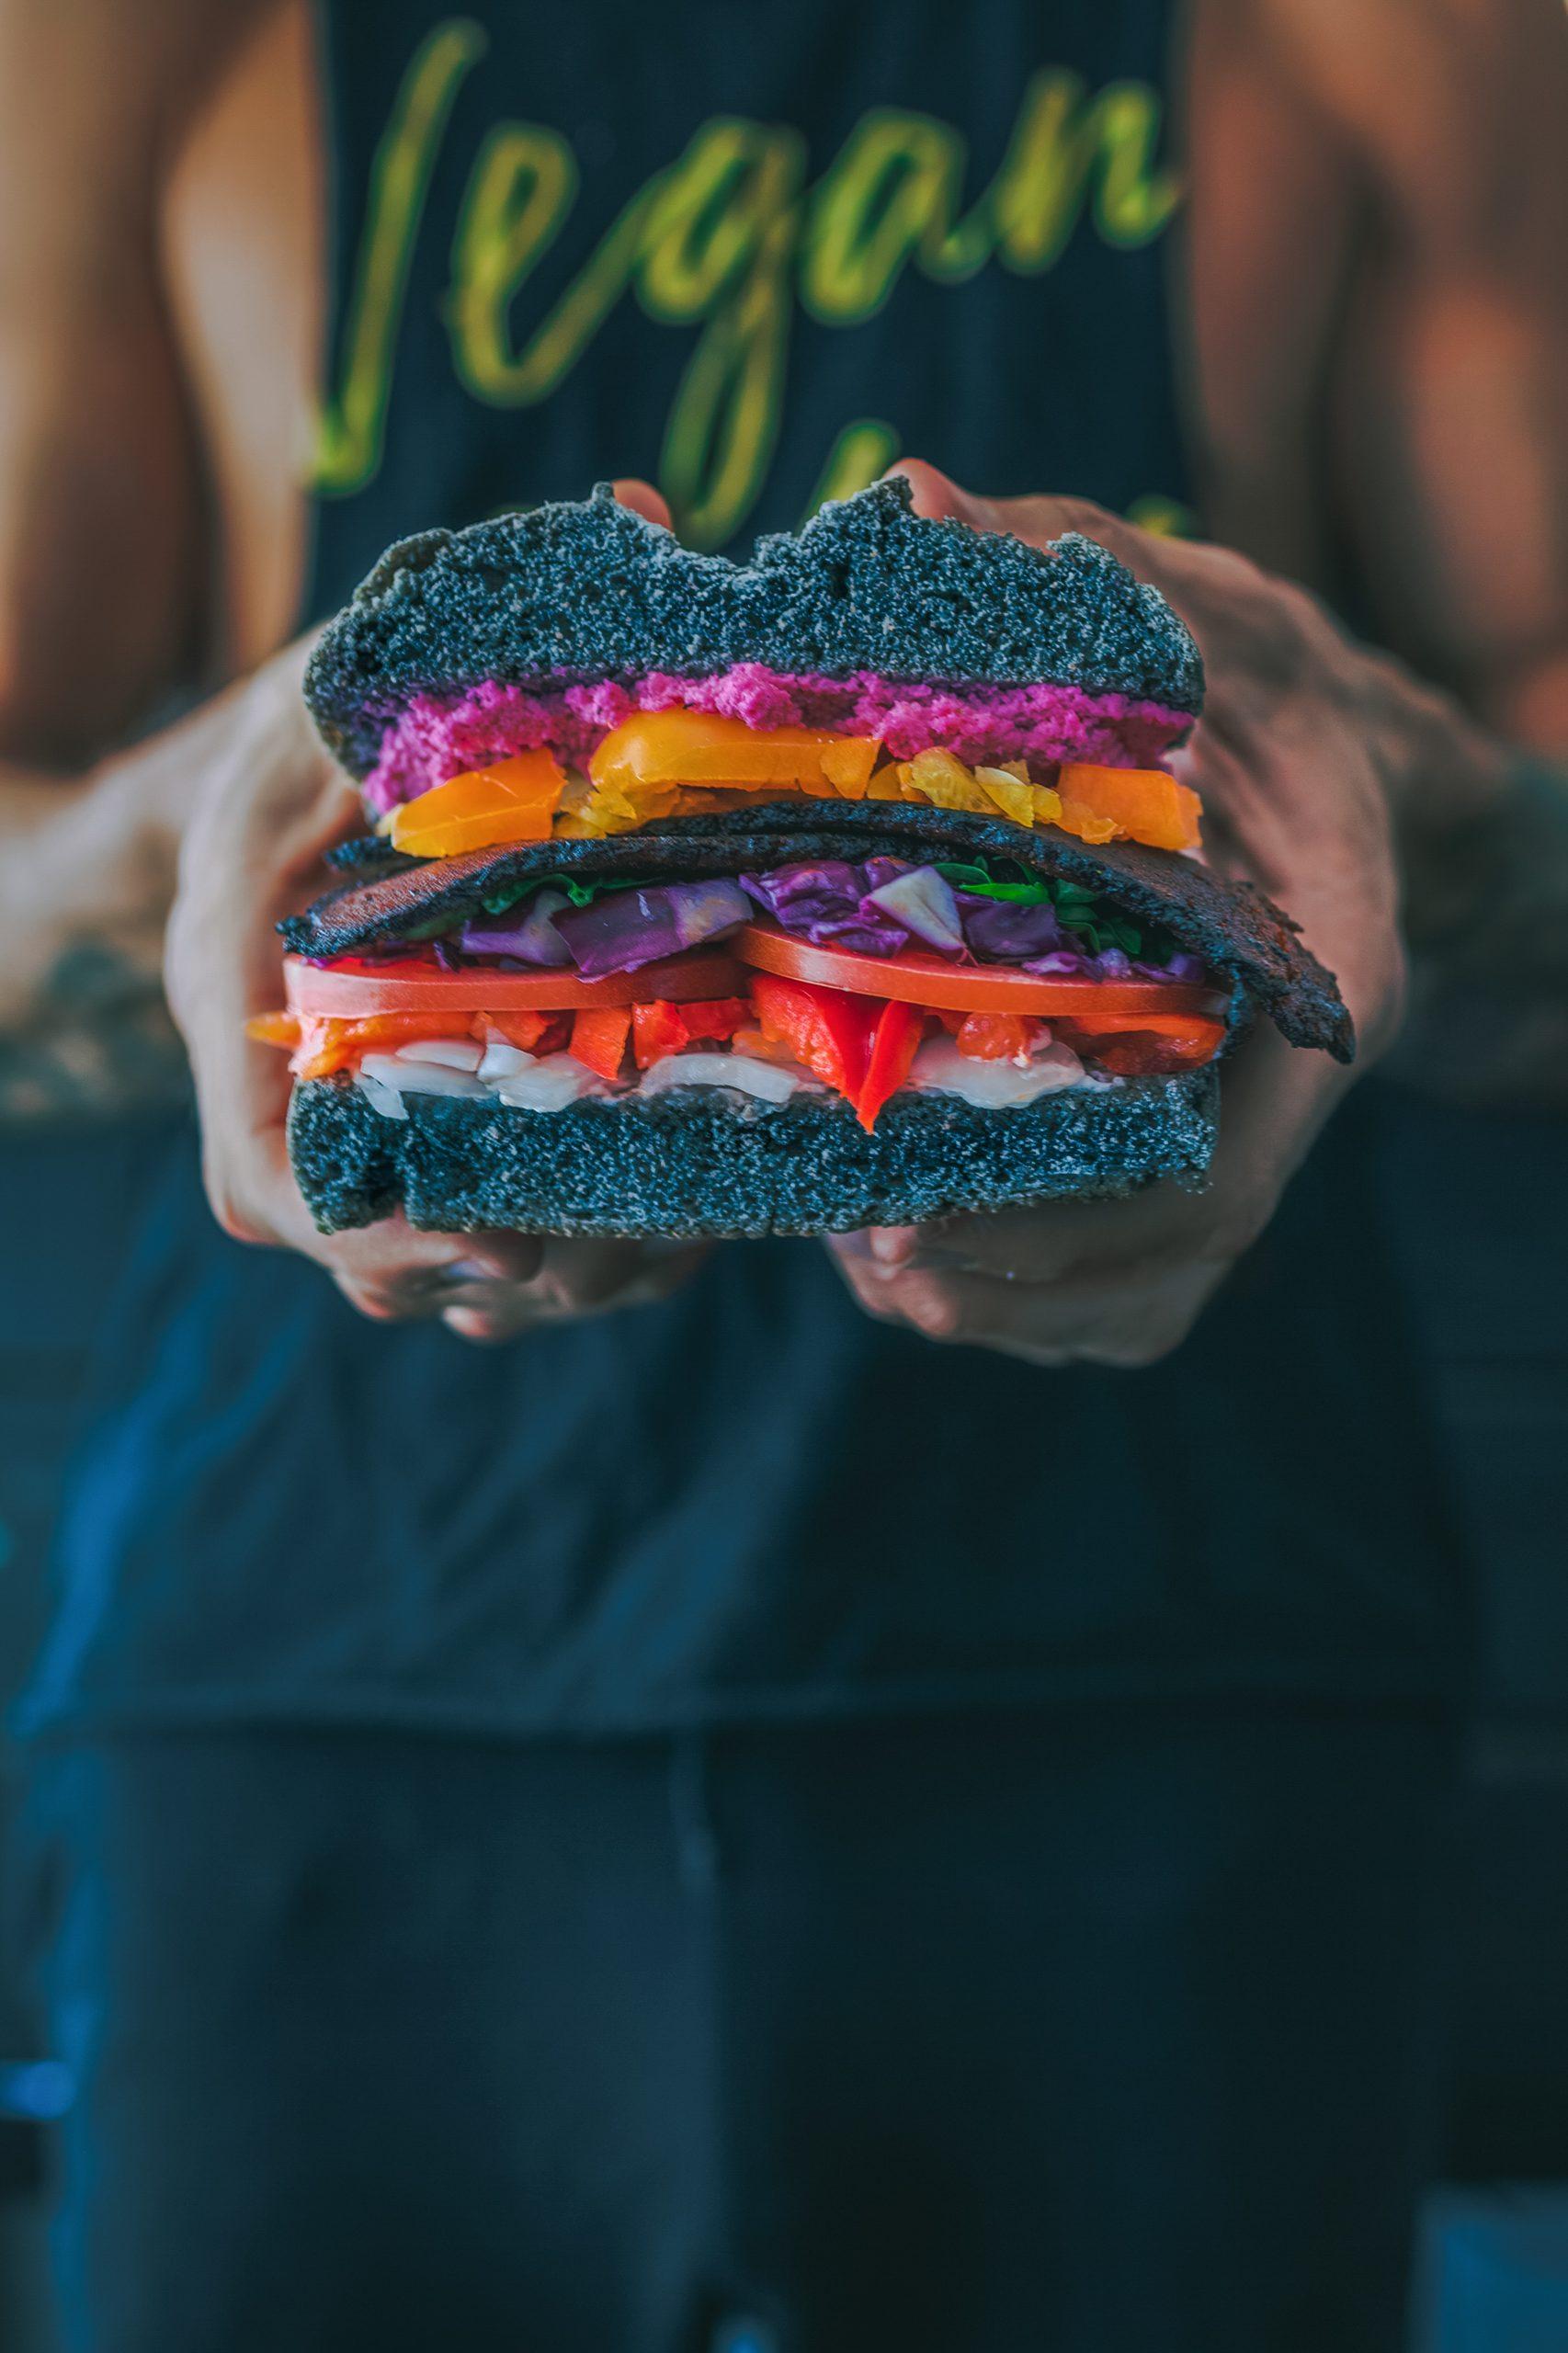 Foods to Avoid on a Vegan Diet